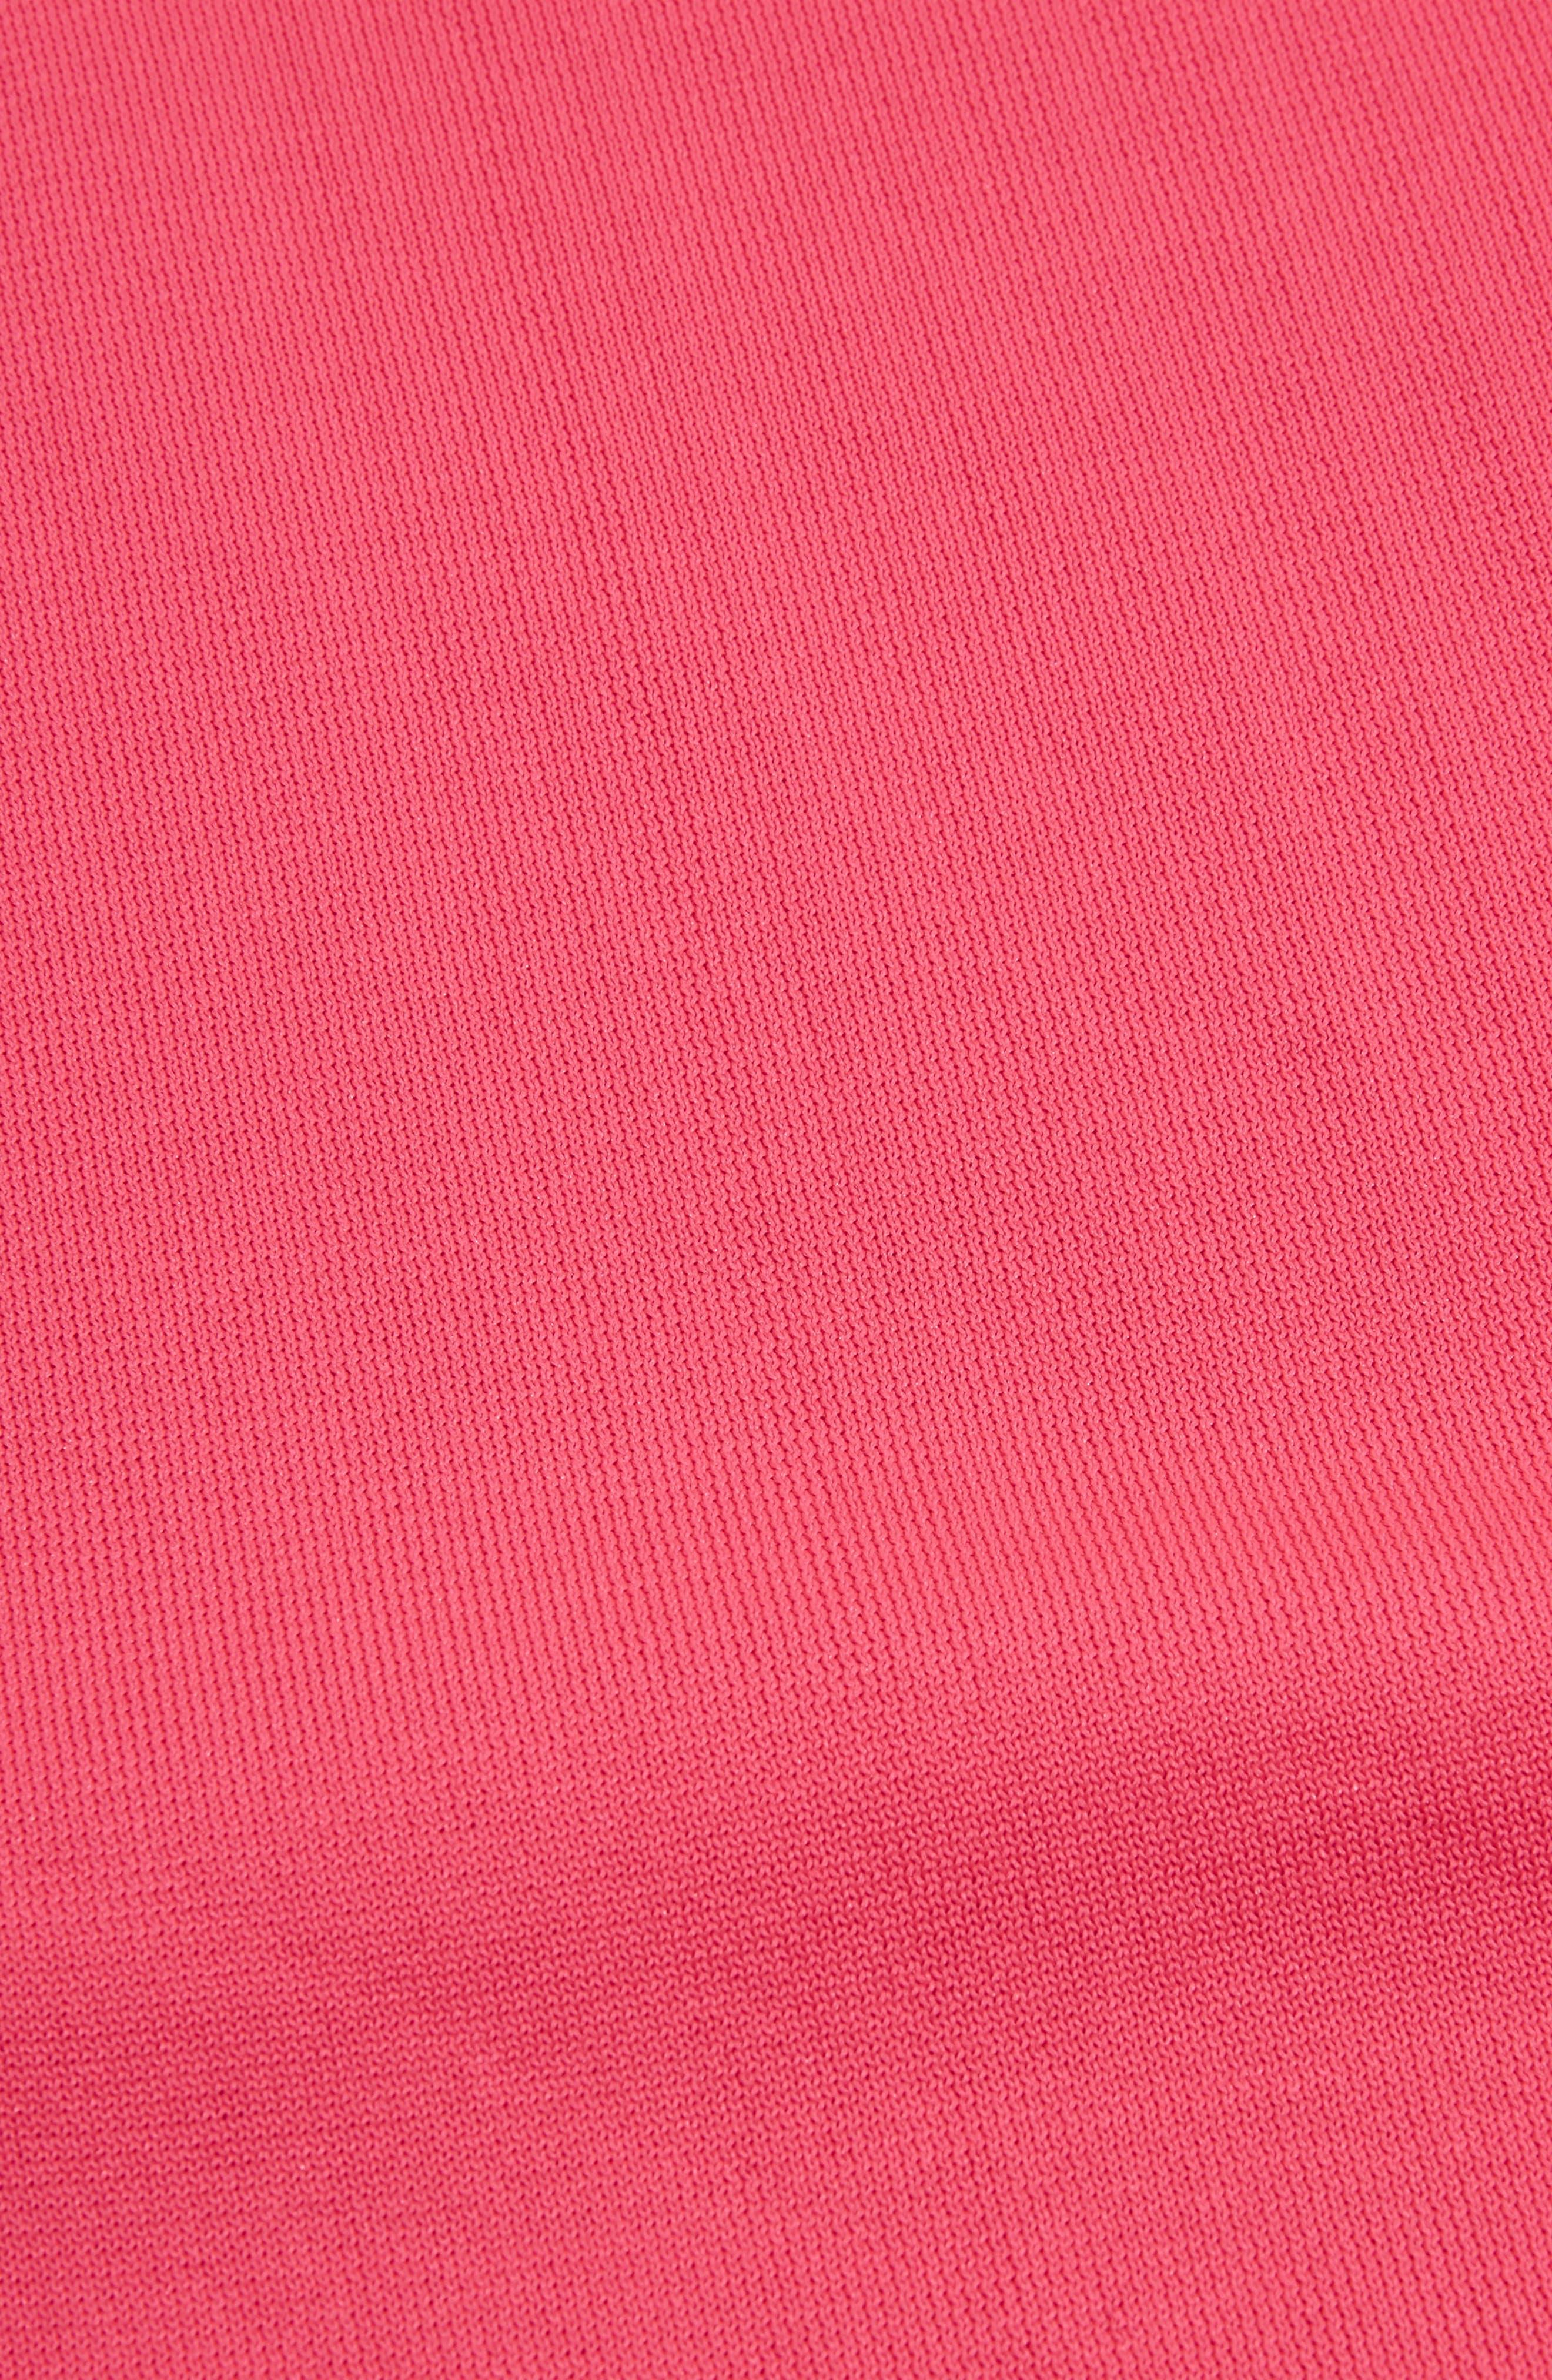 V-Neck Sweater,                             Alternate thumbnail 3, color,                             Bright Pink